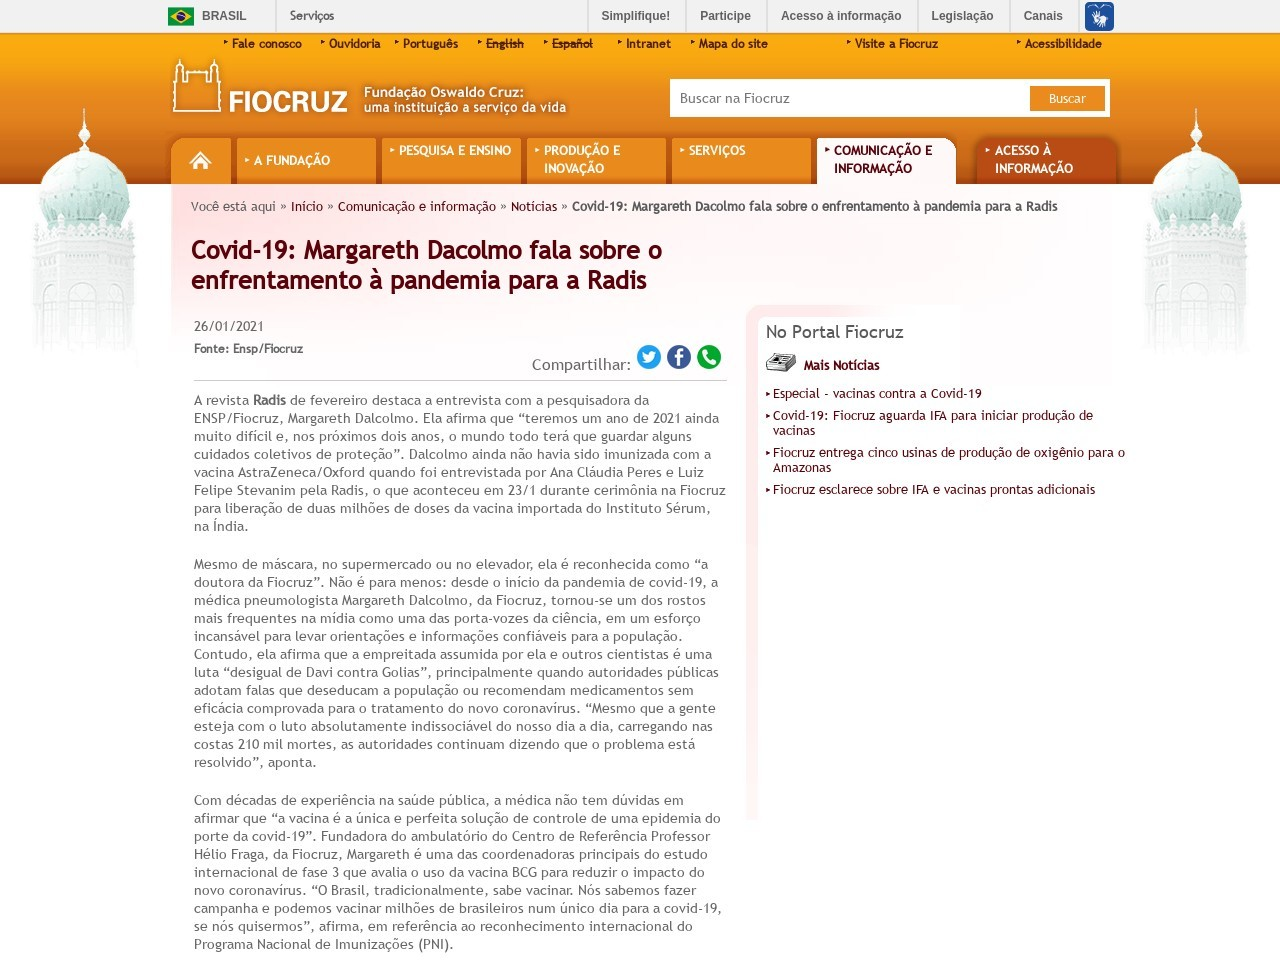 Covid-19: Margareth Dacolmo fala sobre o enfrentamento à pandemia para a Radis - Defesa